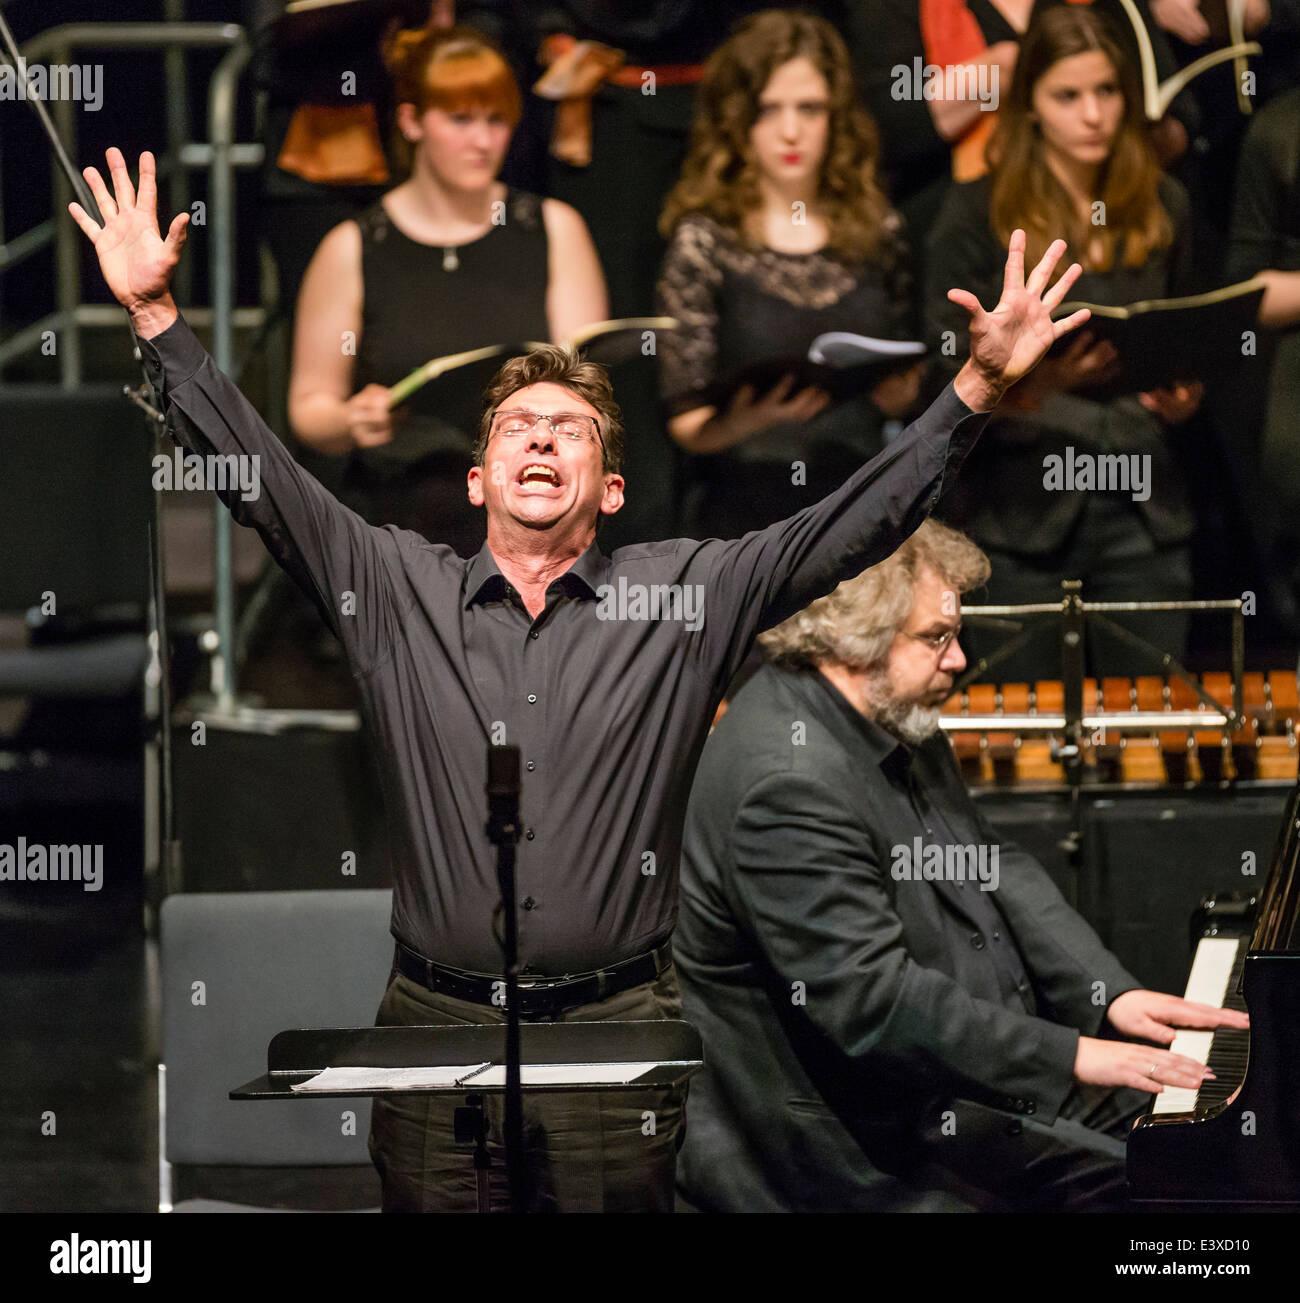 German Baritone Peter Schüler sings in a concert. - Stock Image